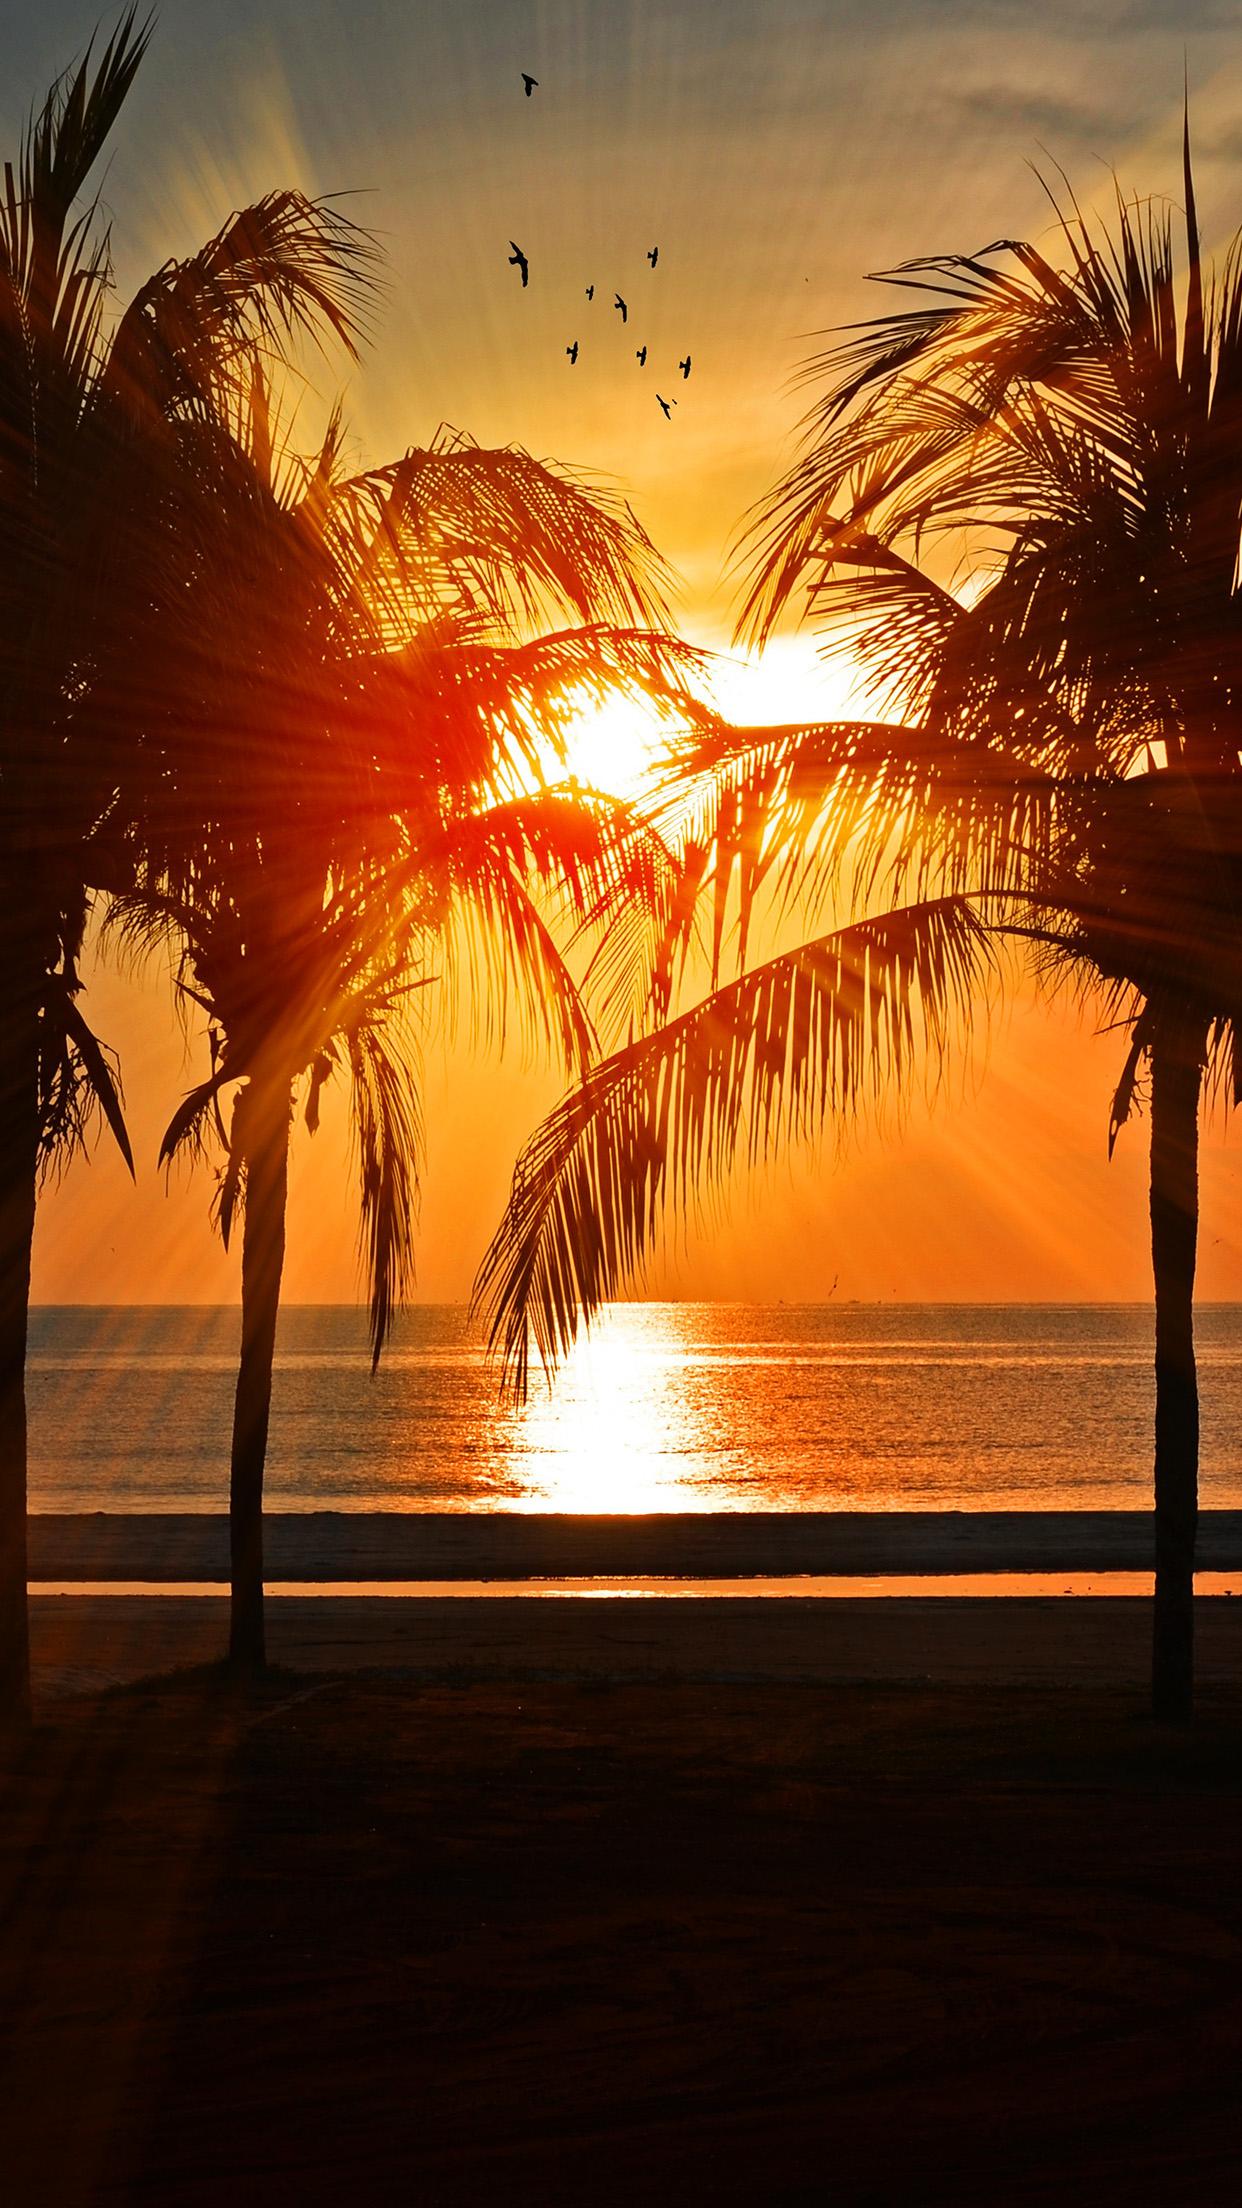 Nl74 Beach Vacation Summer Night Sunset Red Palm Tree